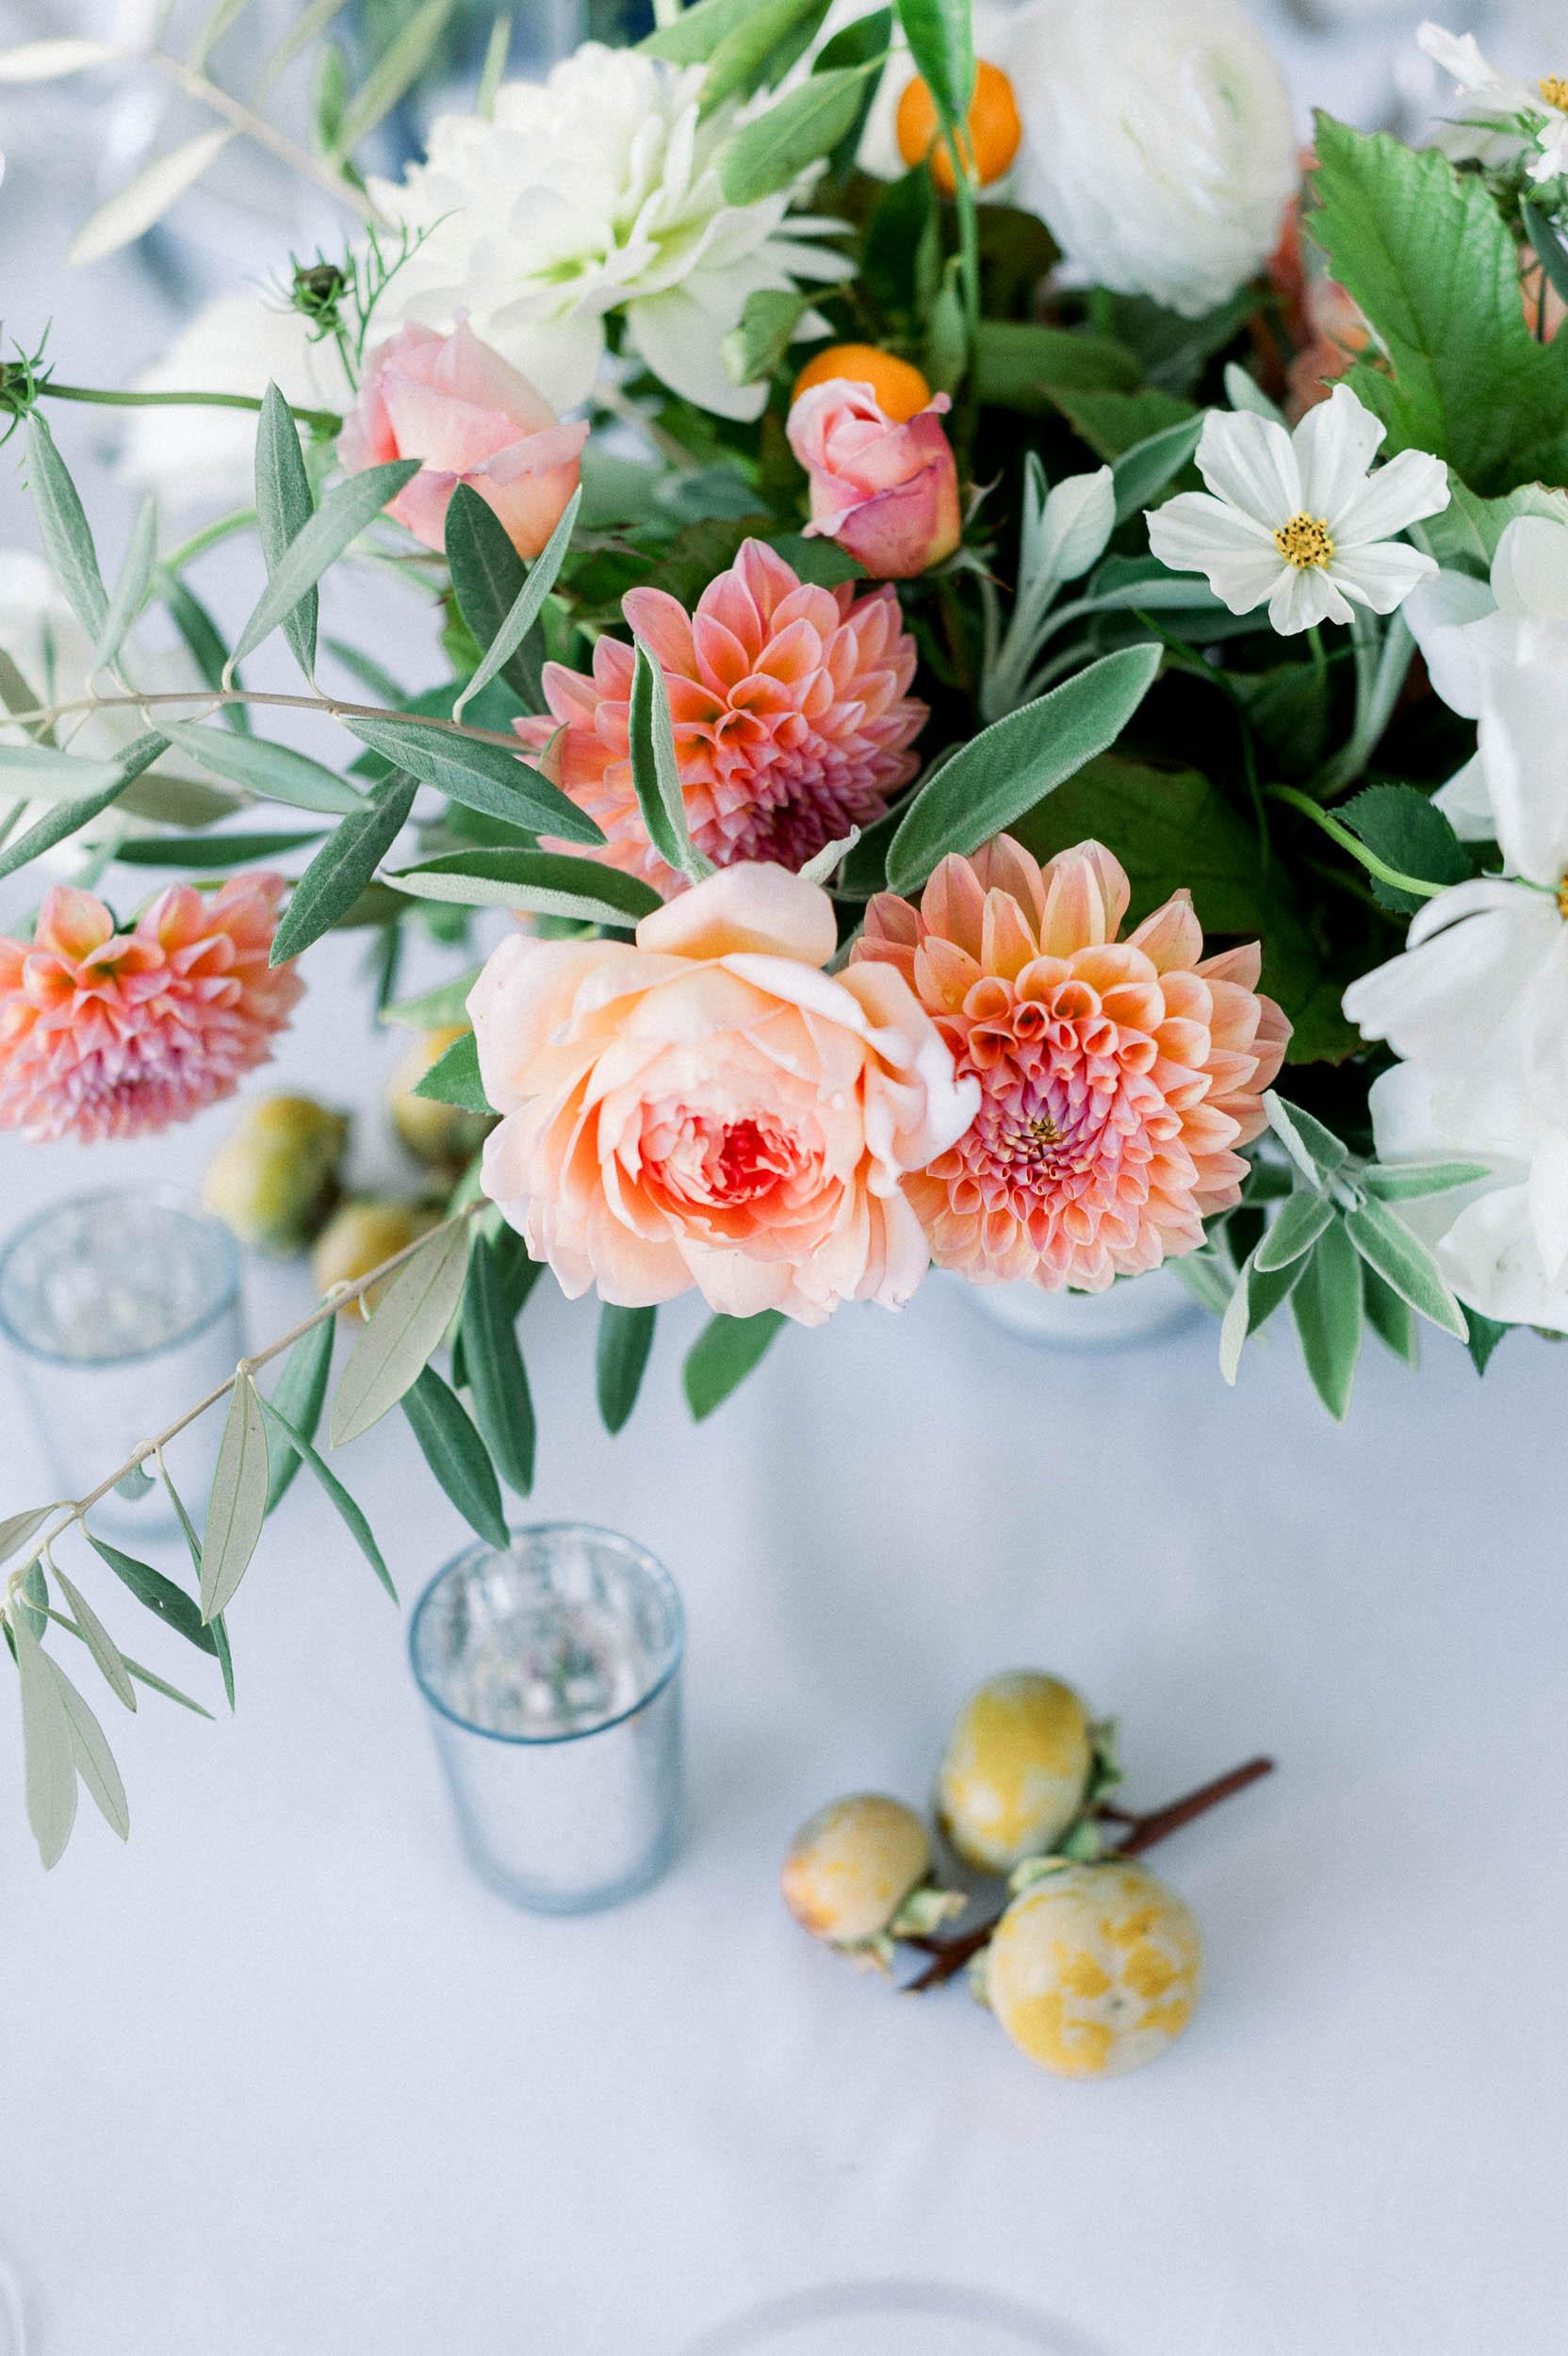 092218KF0863_Sausalito Yacht Club Wedding_Buena Lane Photography.jpg